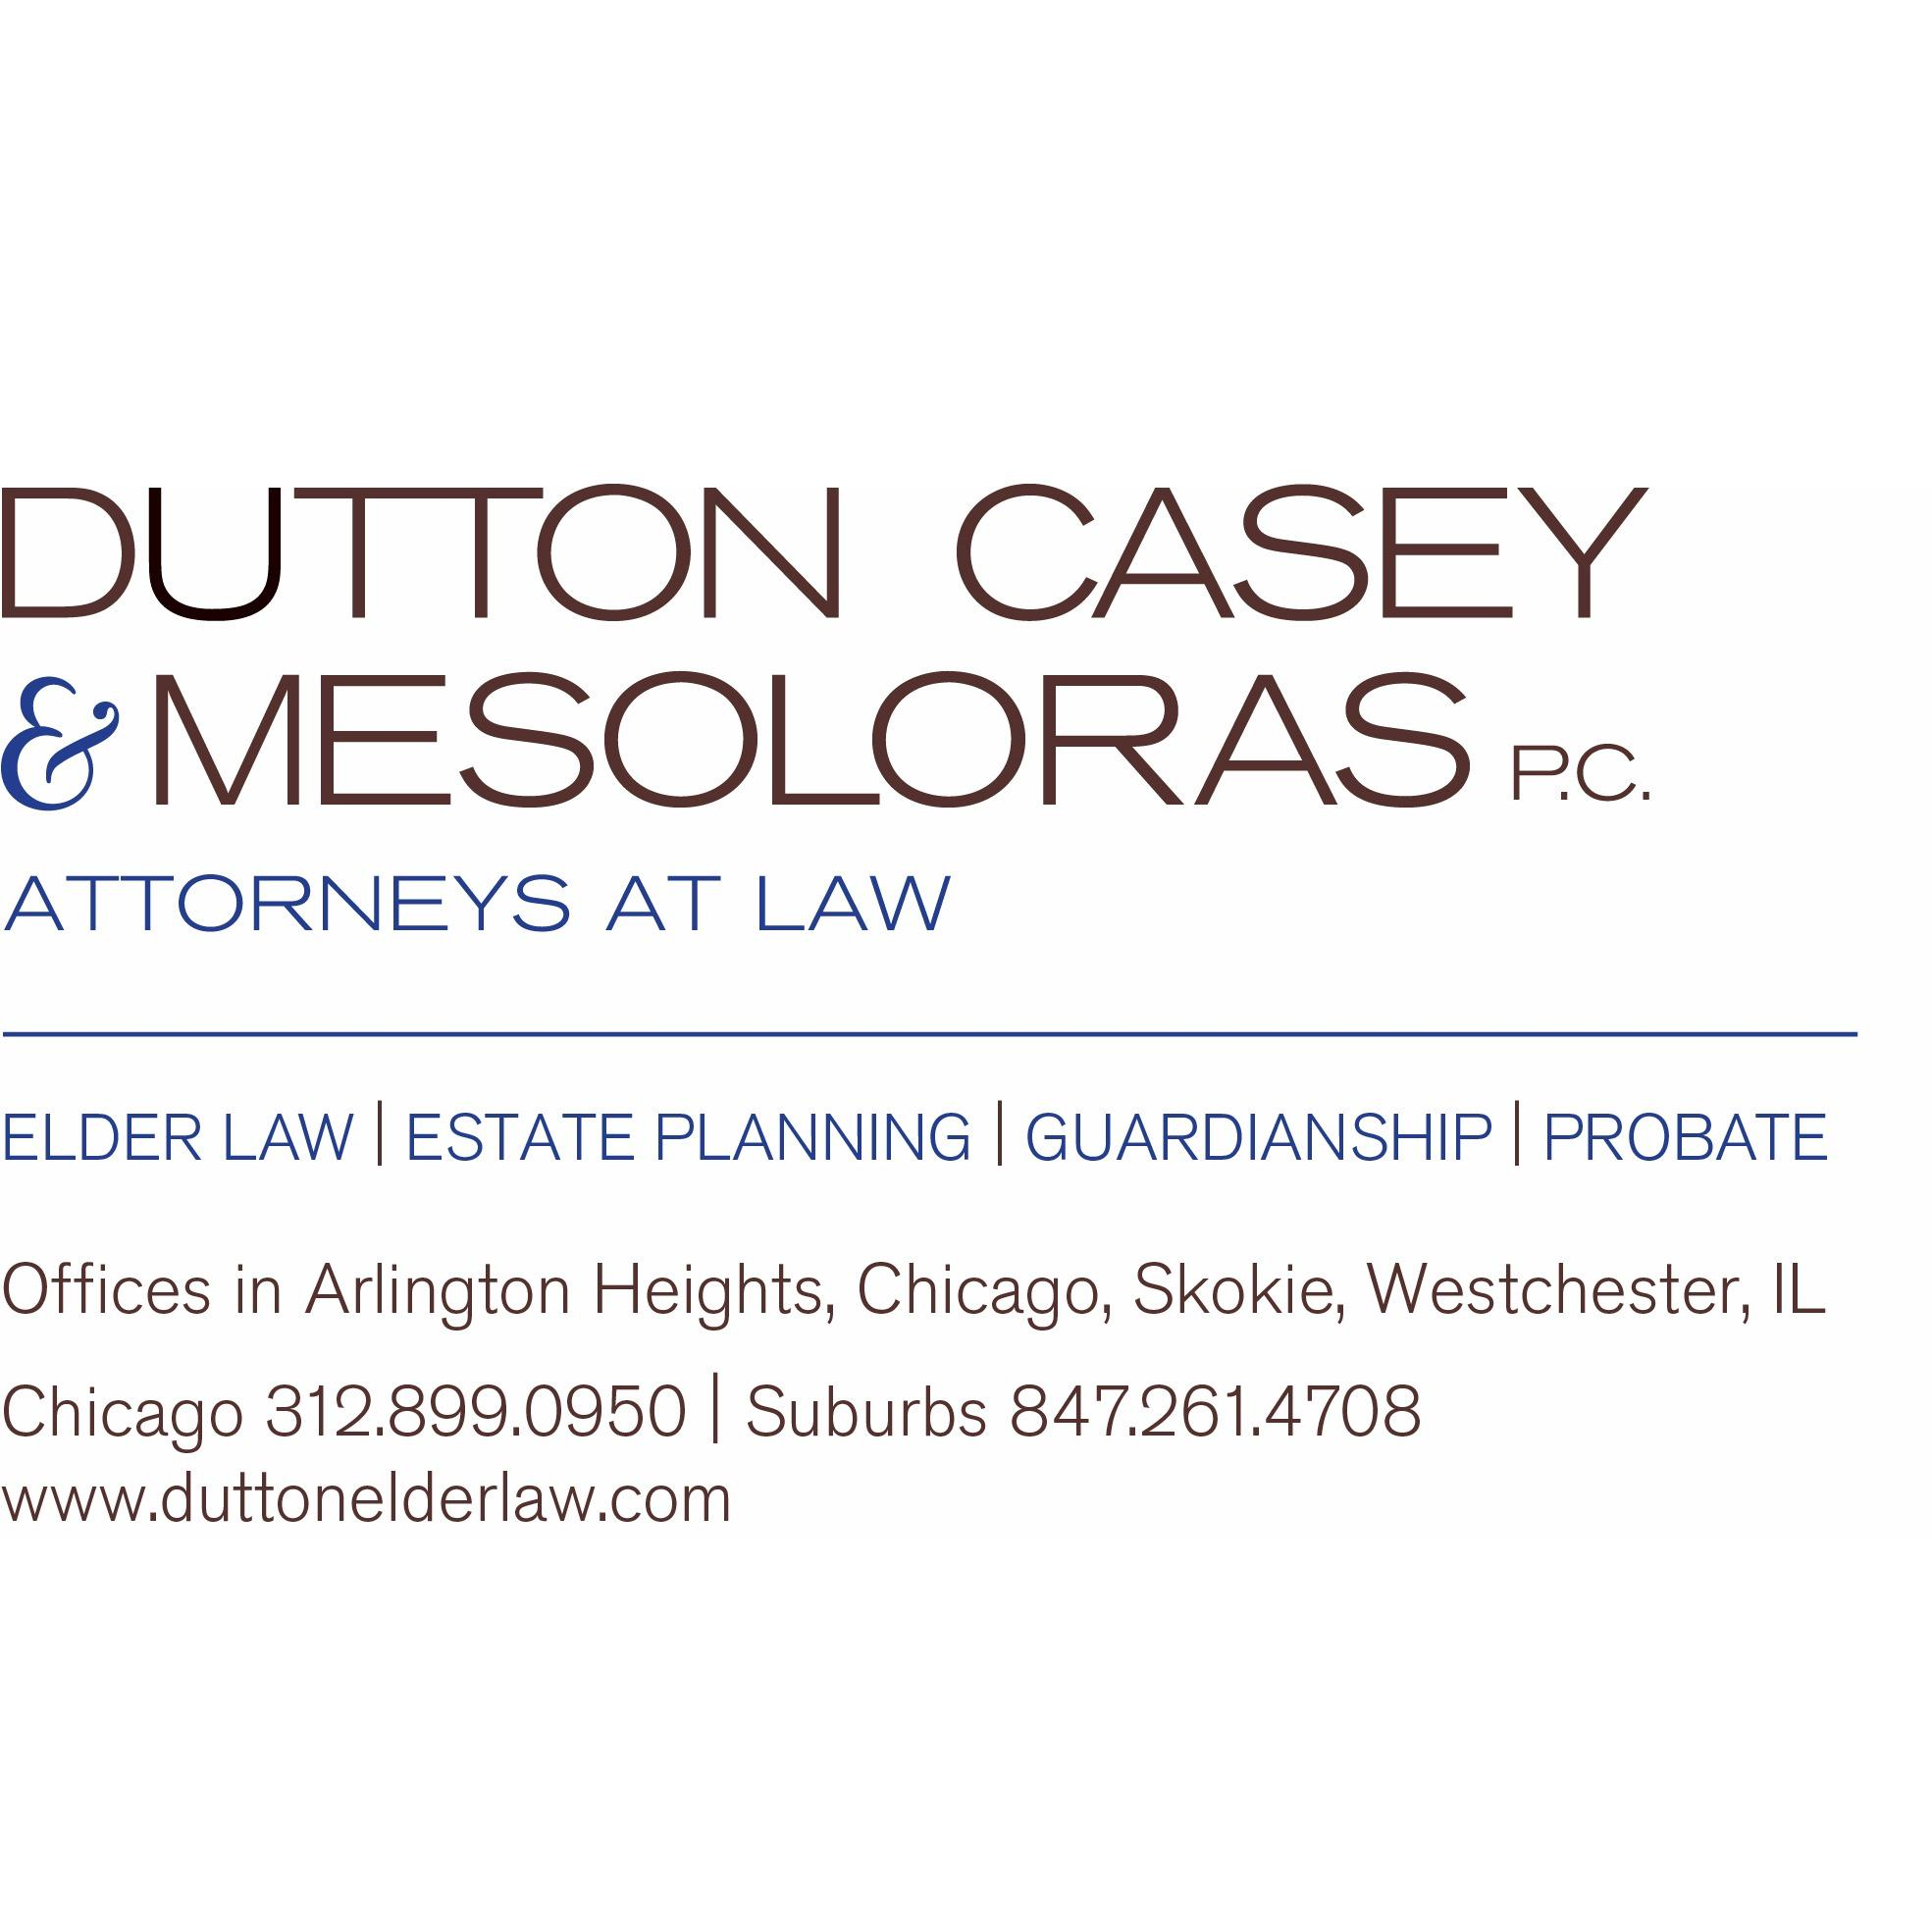 photo of Dutton Casey & Mesoloras, Attorneys at Law - elder law, estate planning, guardianship, probate